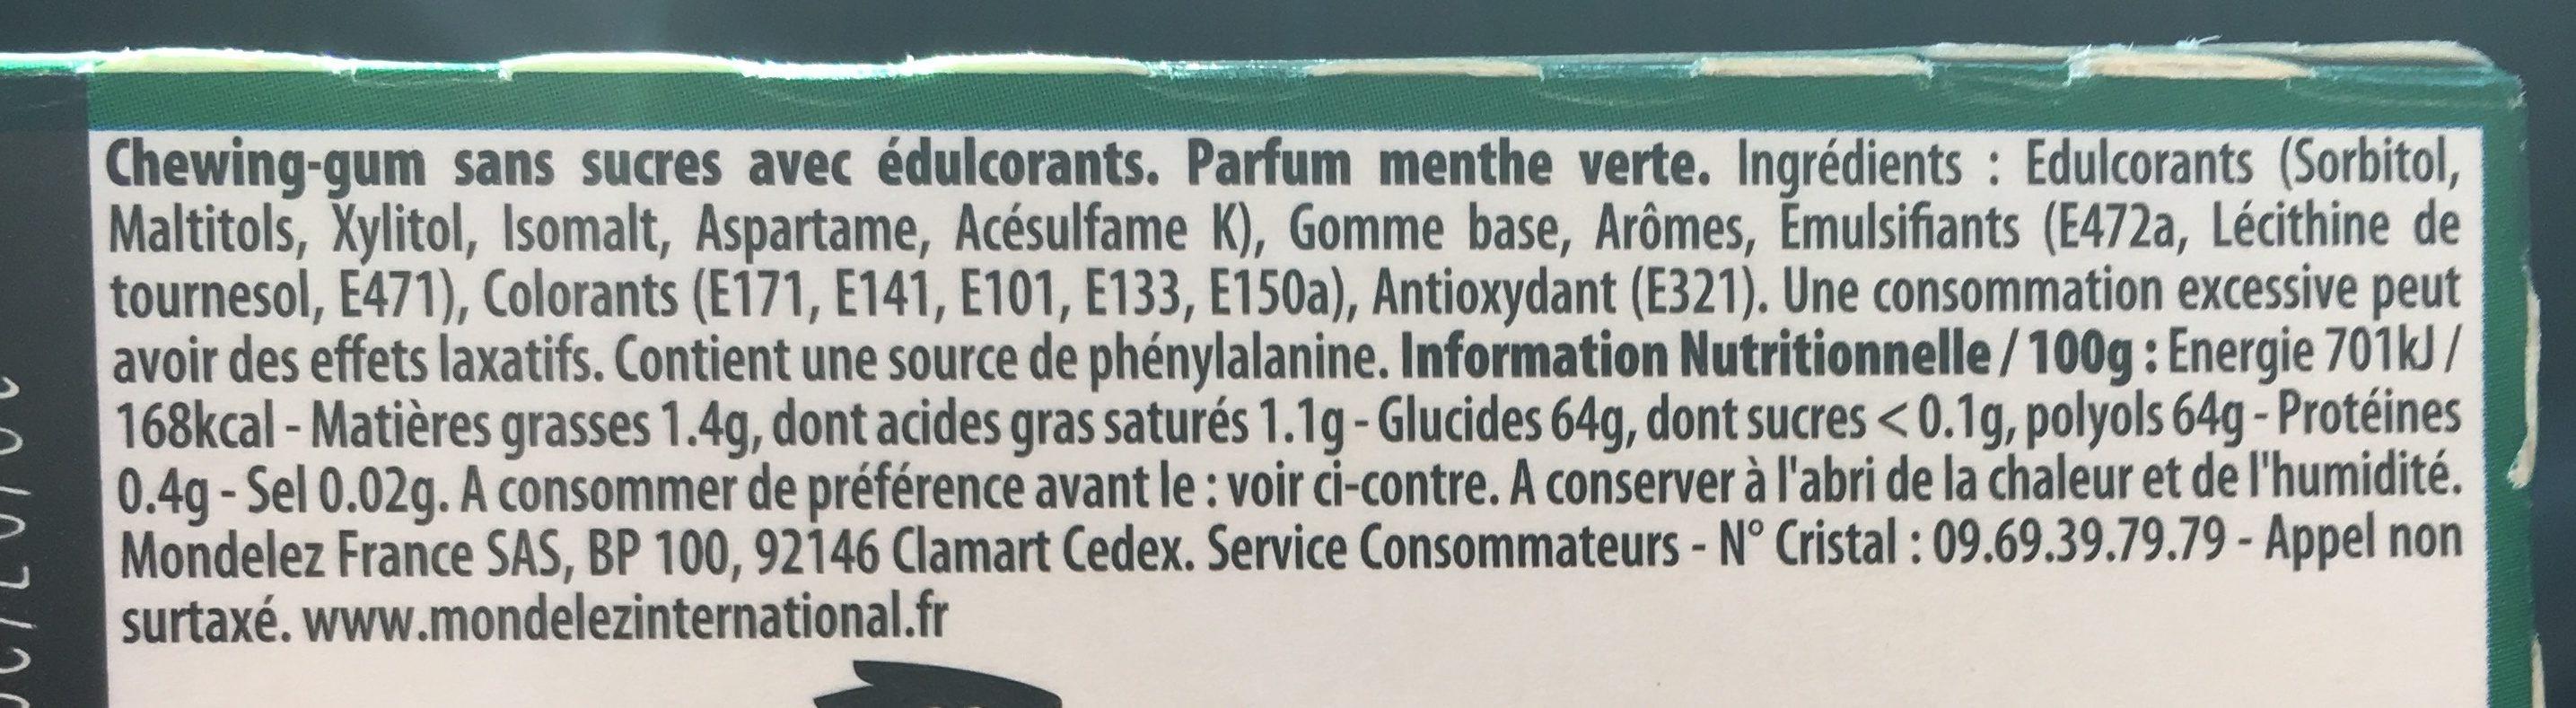 Menthe verte max sans sucres - Ingrédients - fr